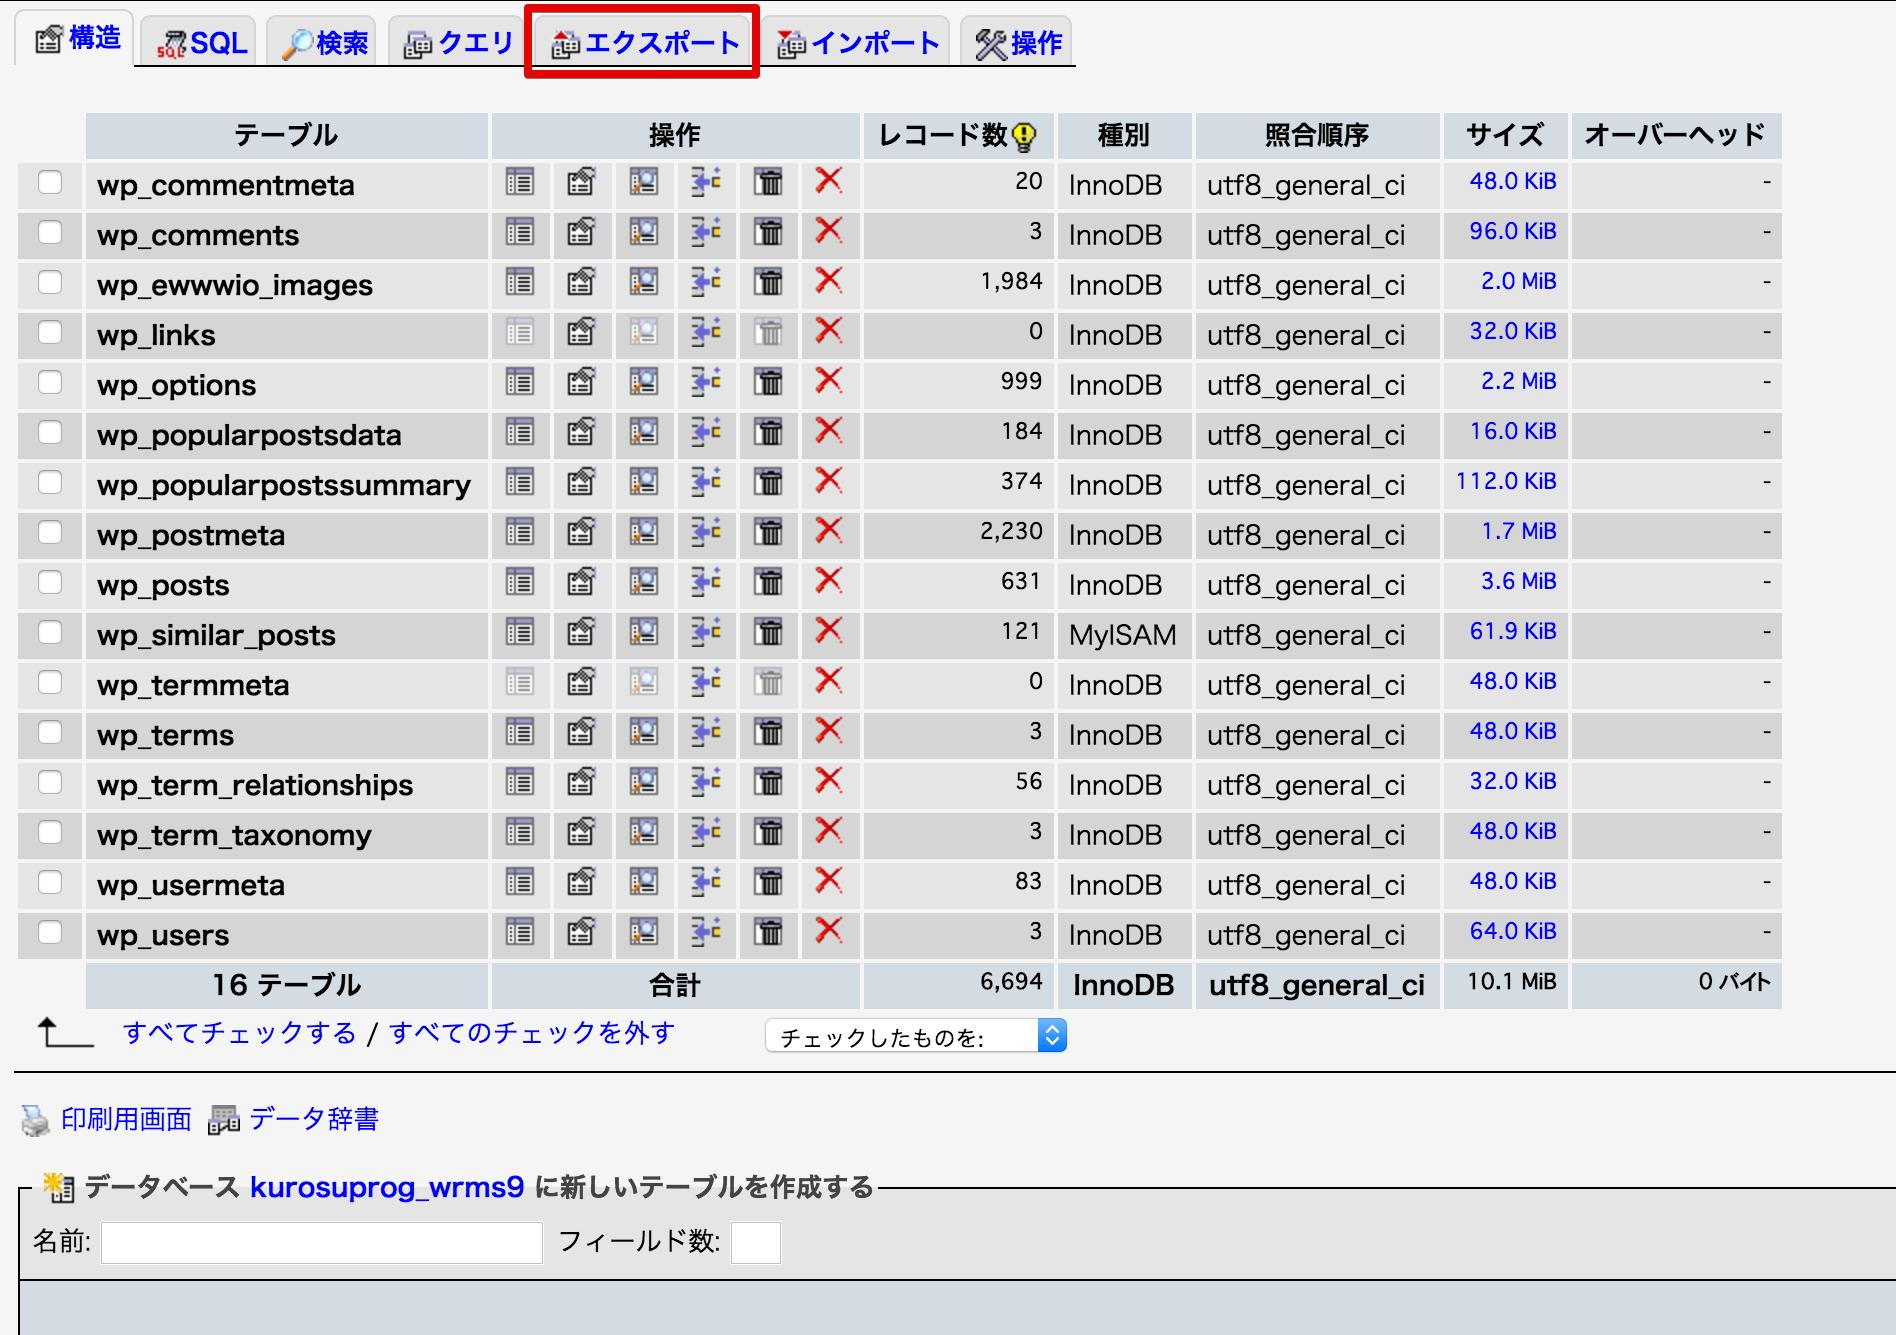 export 1 - wordpressのドメイン変更9つのステップと移行時の注意点まとめ